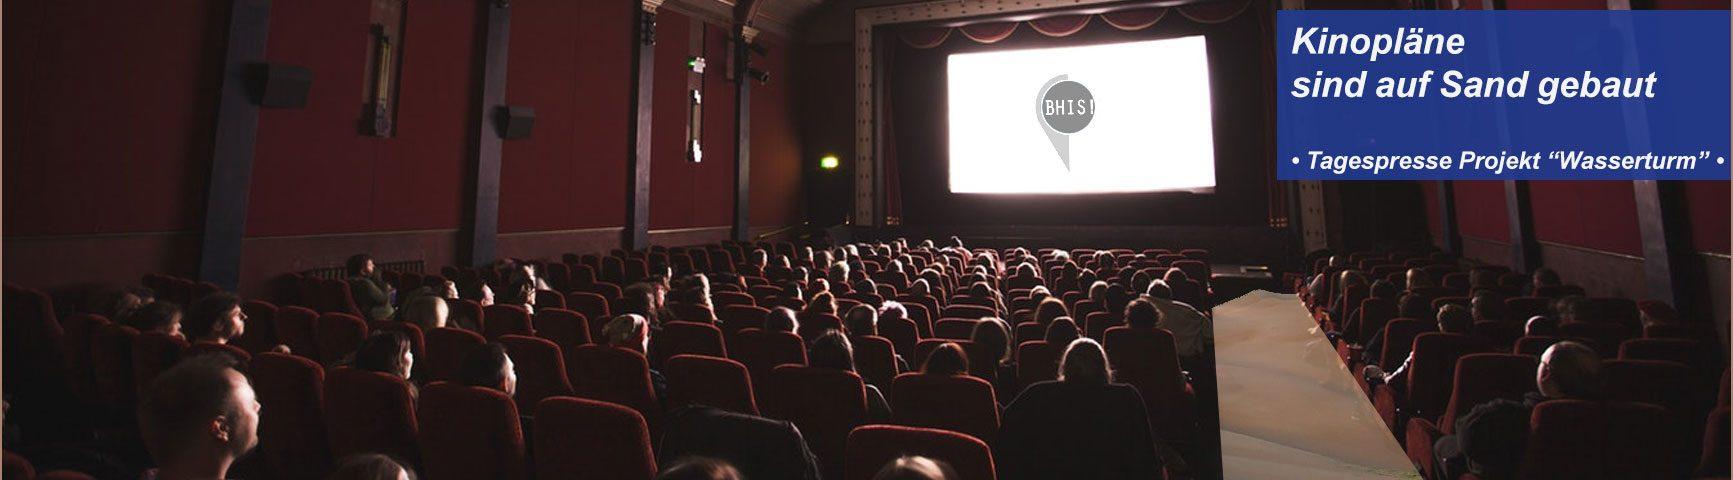 Kino Blb